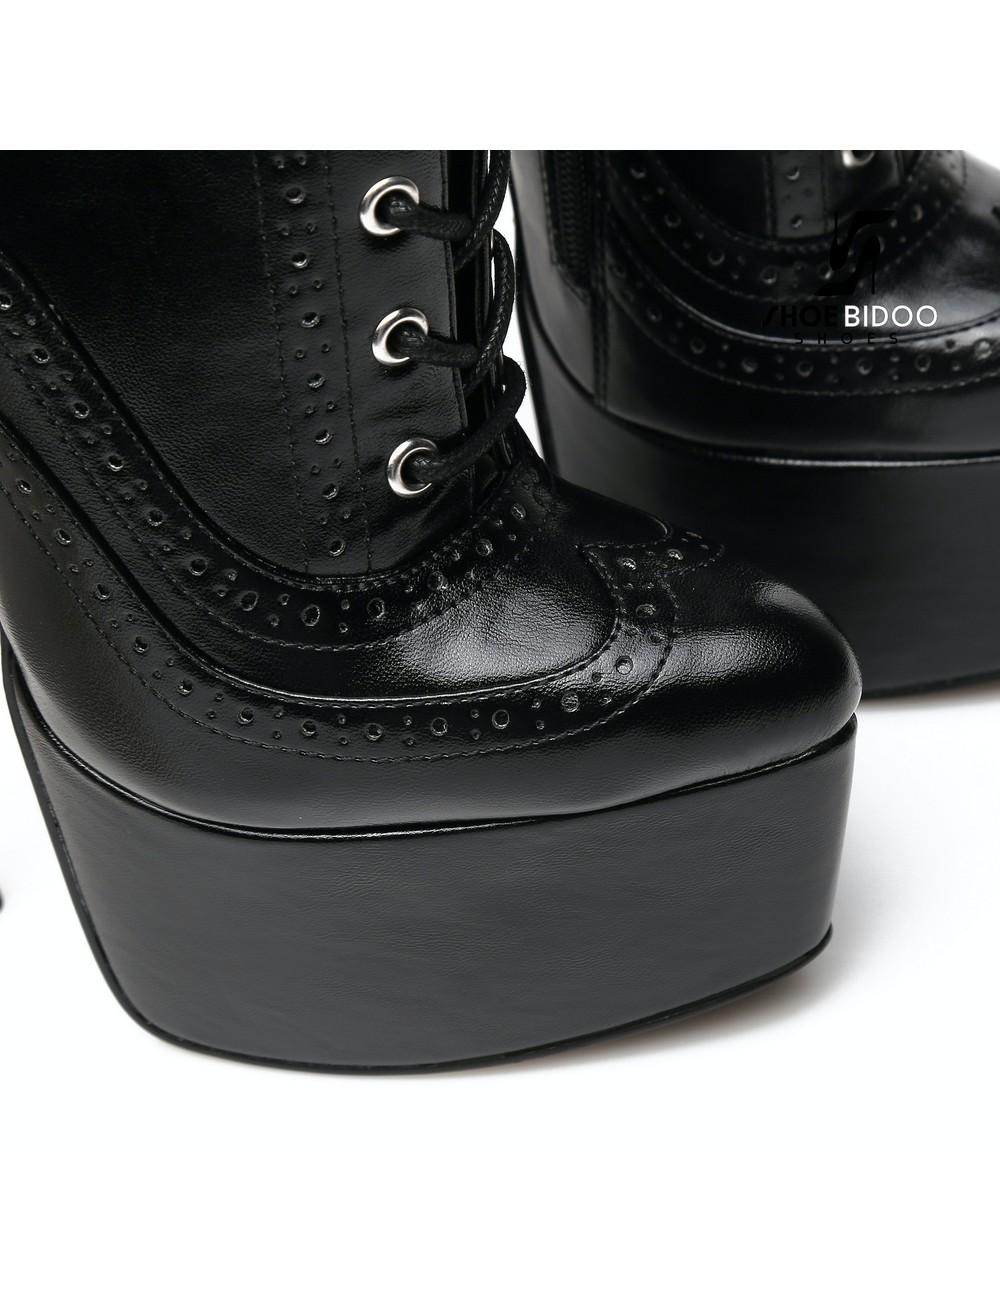 Giaro SLICK Black Giaro SLICK Fetish platform booties with silver heels